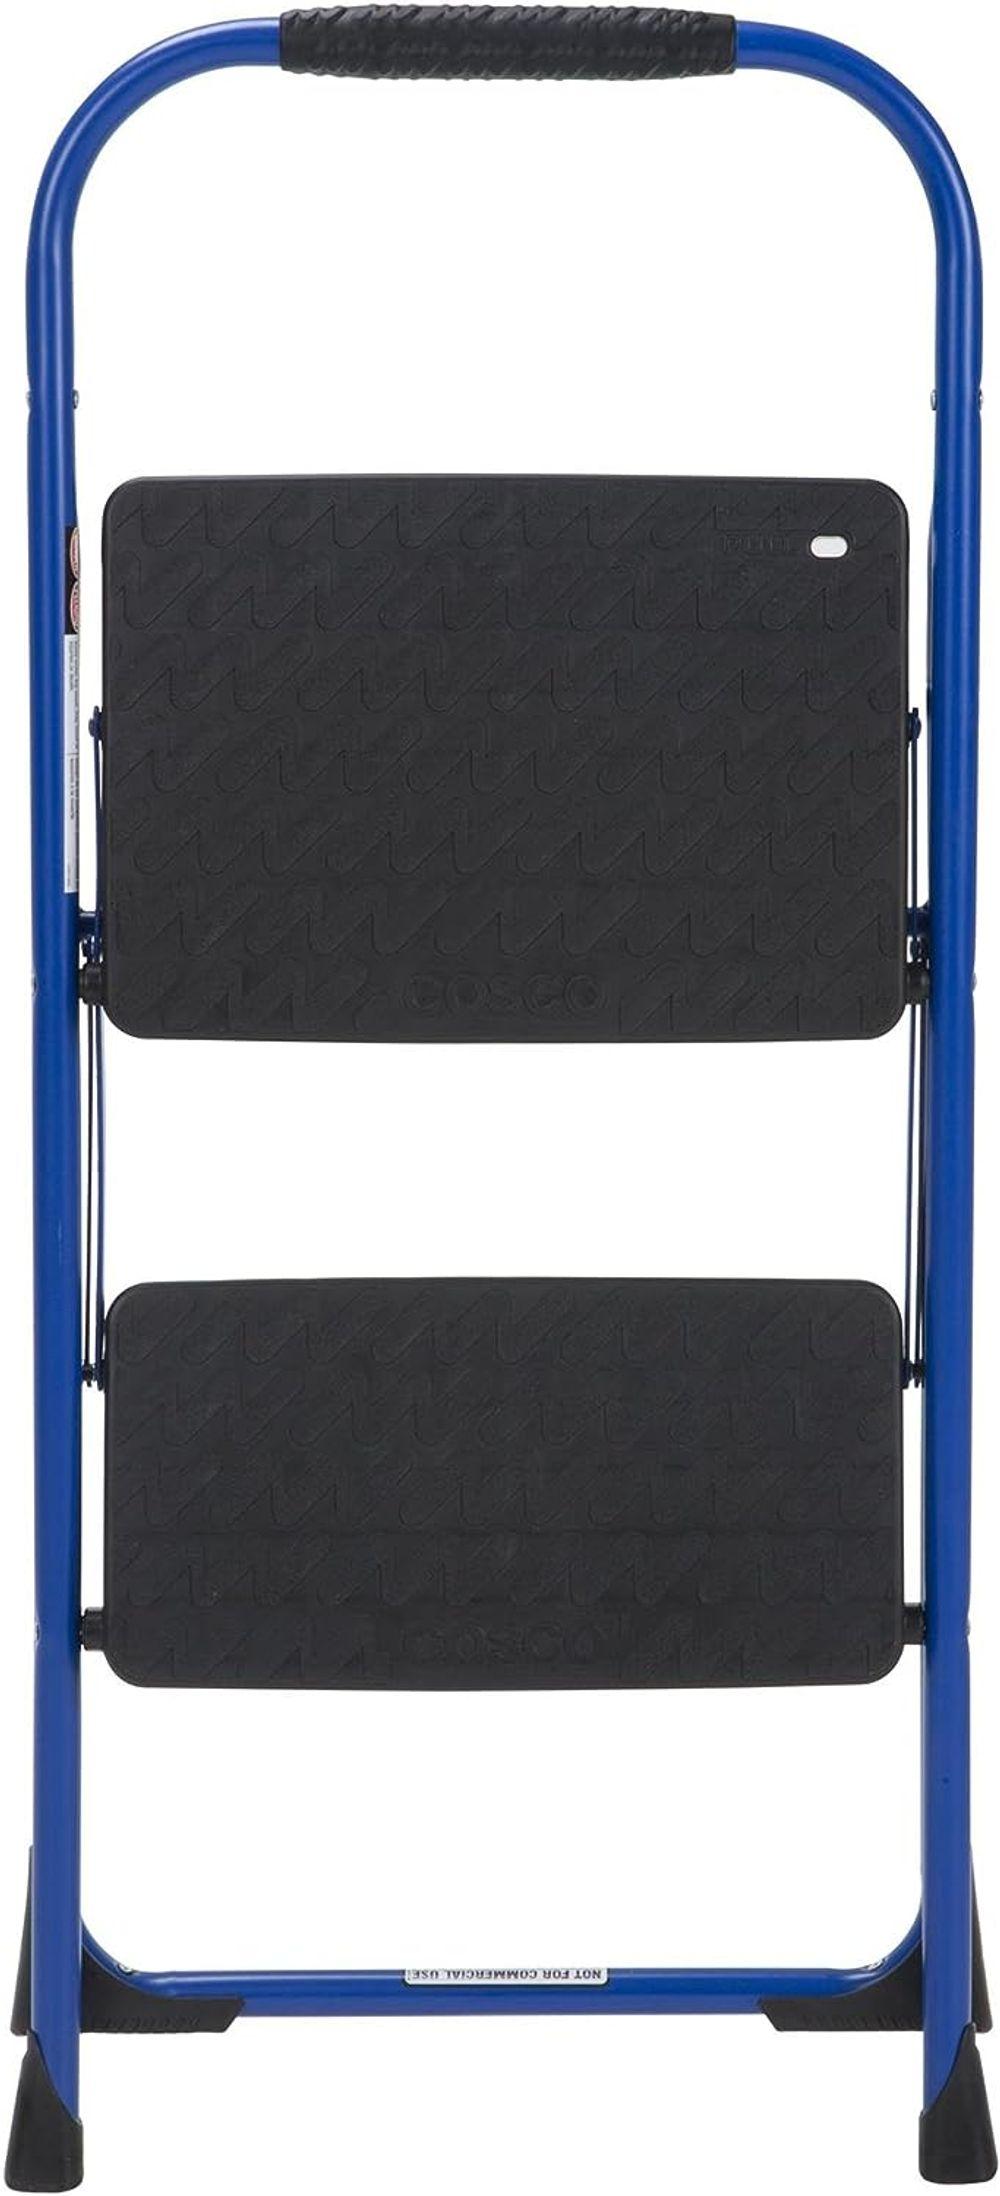 Cosco 11308SWB1E Two, Blue Three Big Folding Step Stool with Rubber Hand Grip